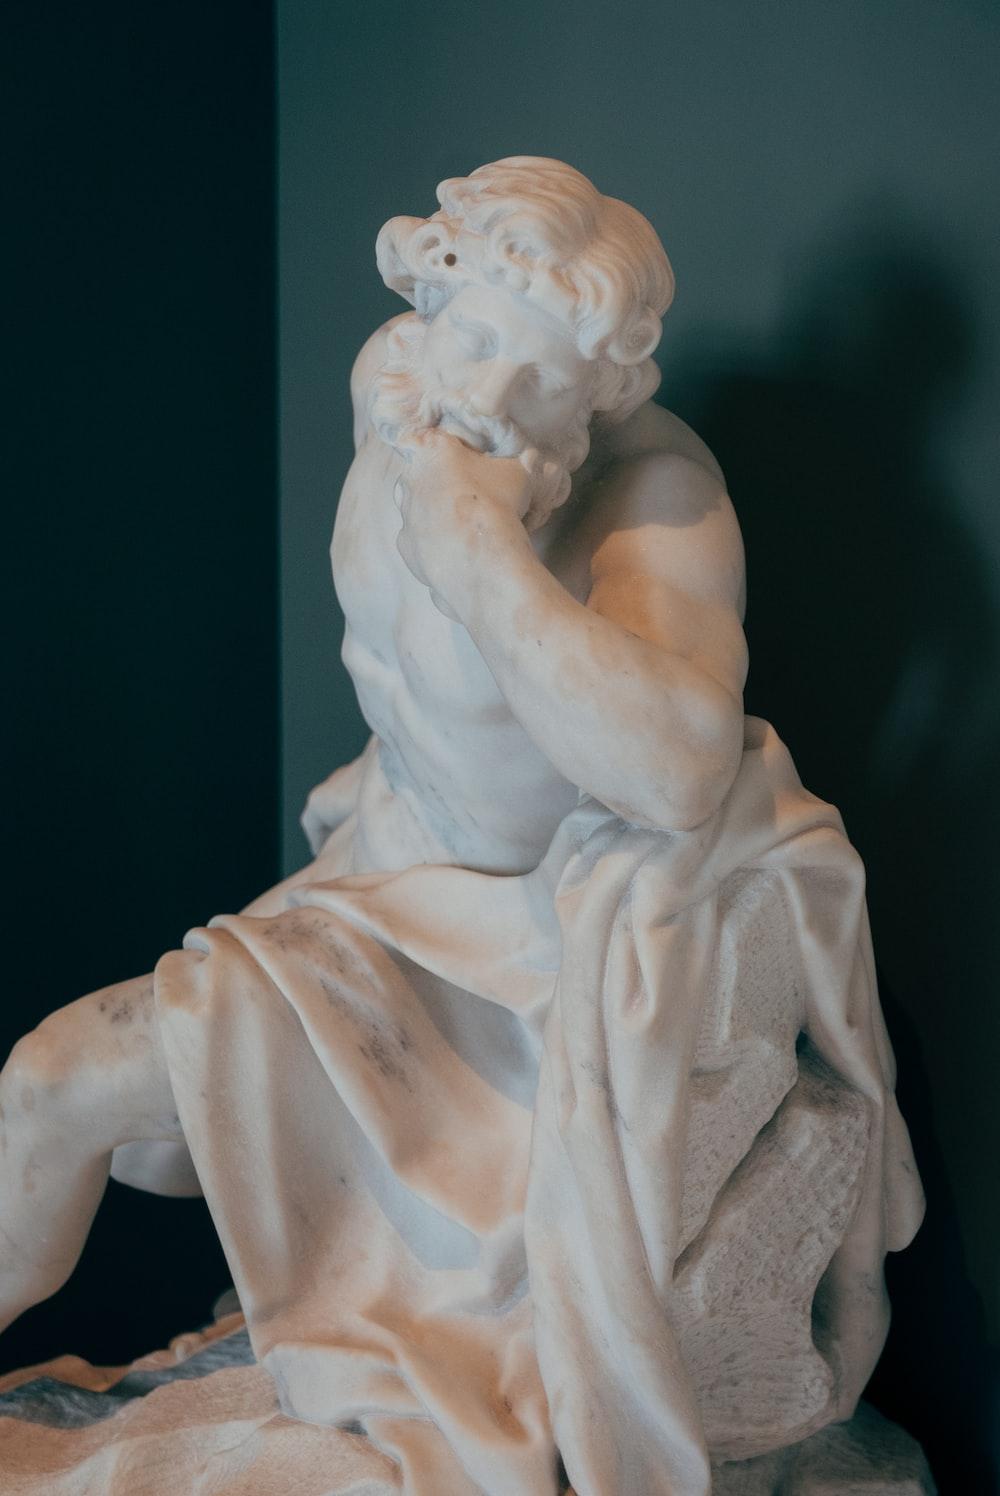 woman in white dress figurine